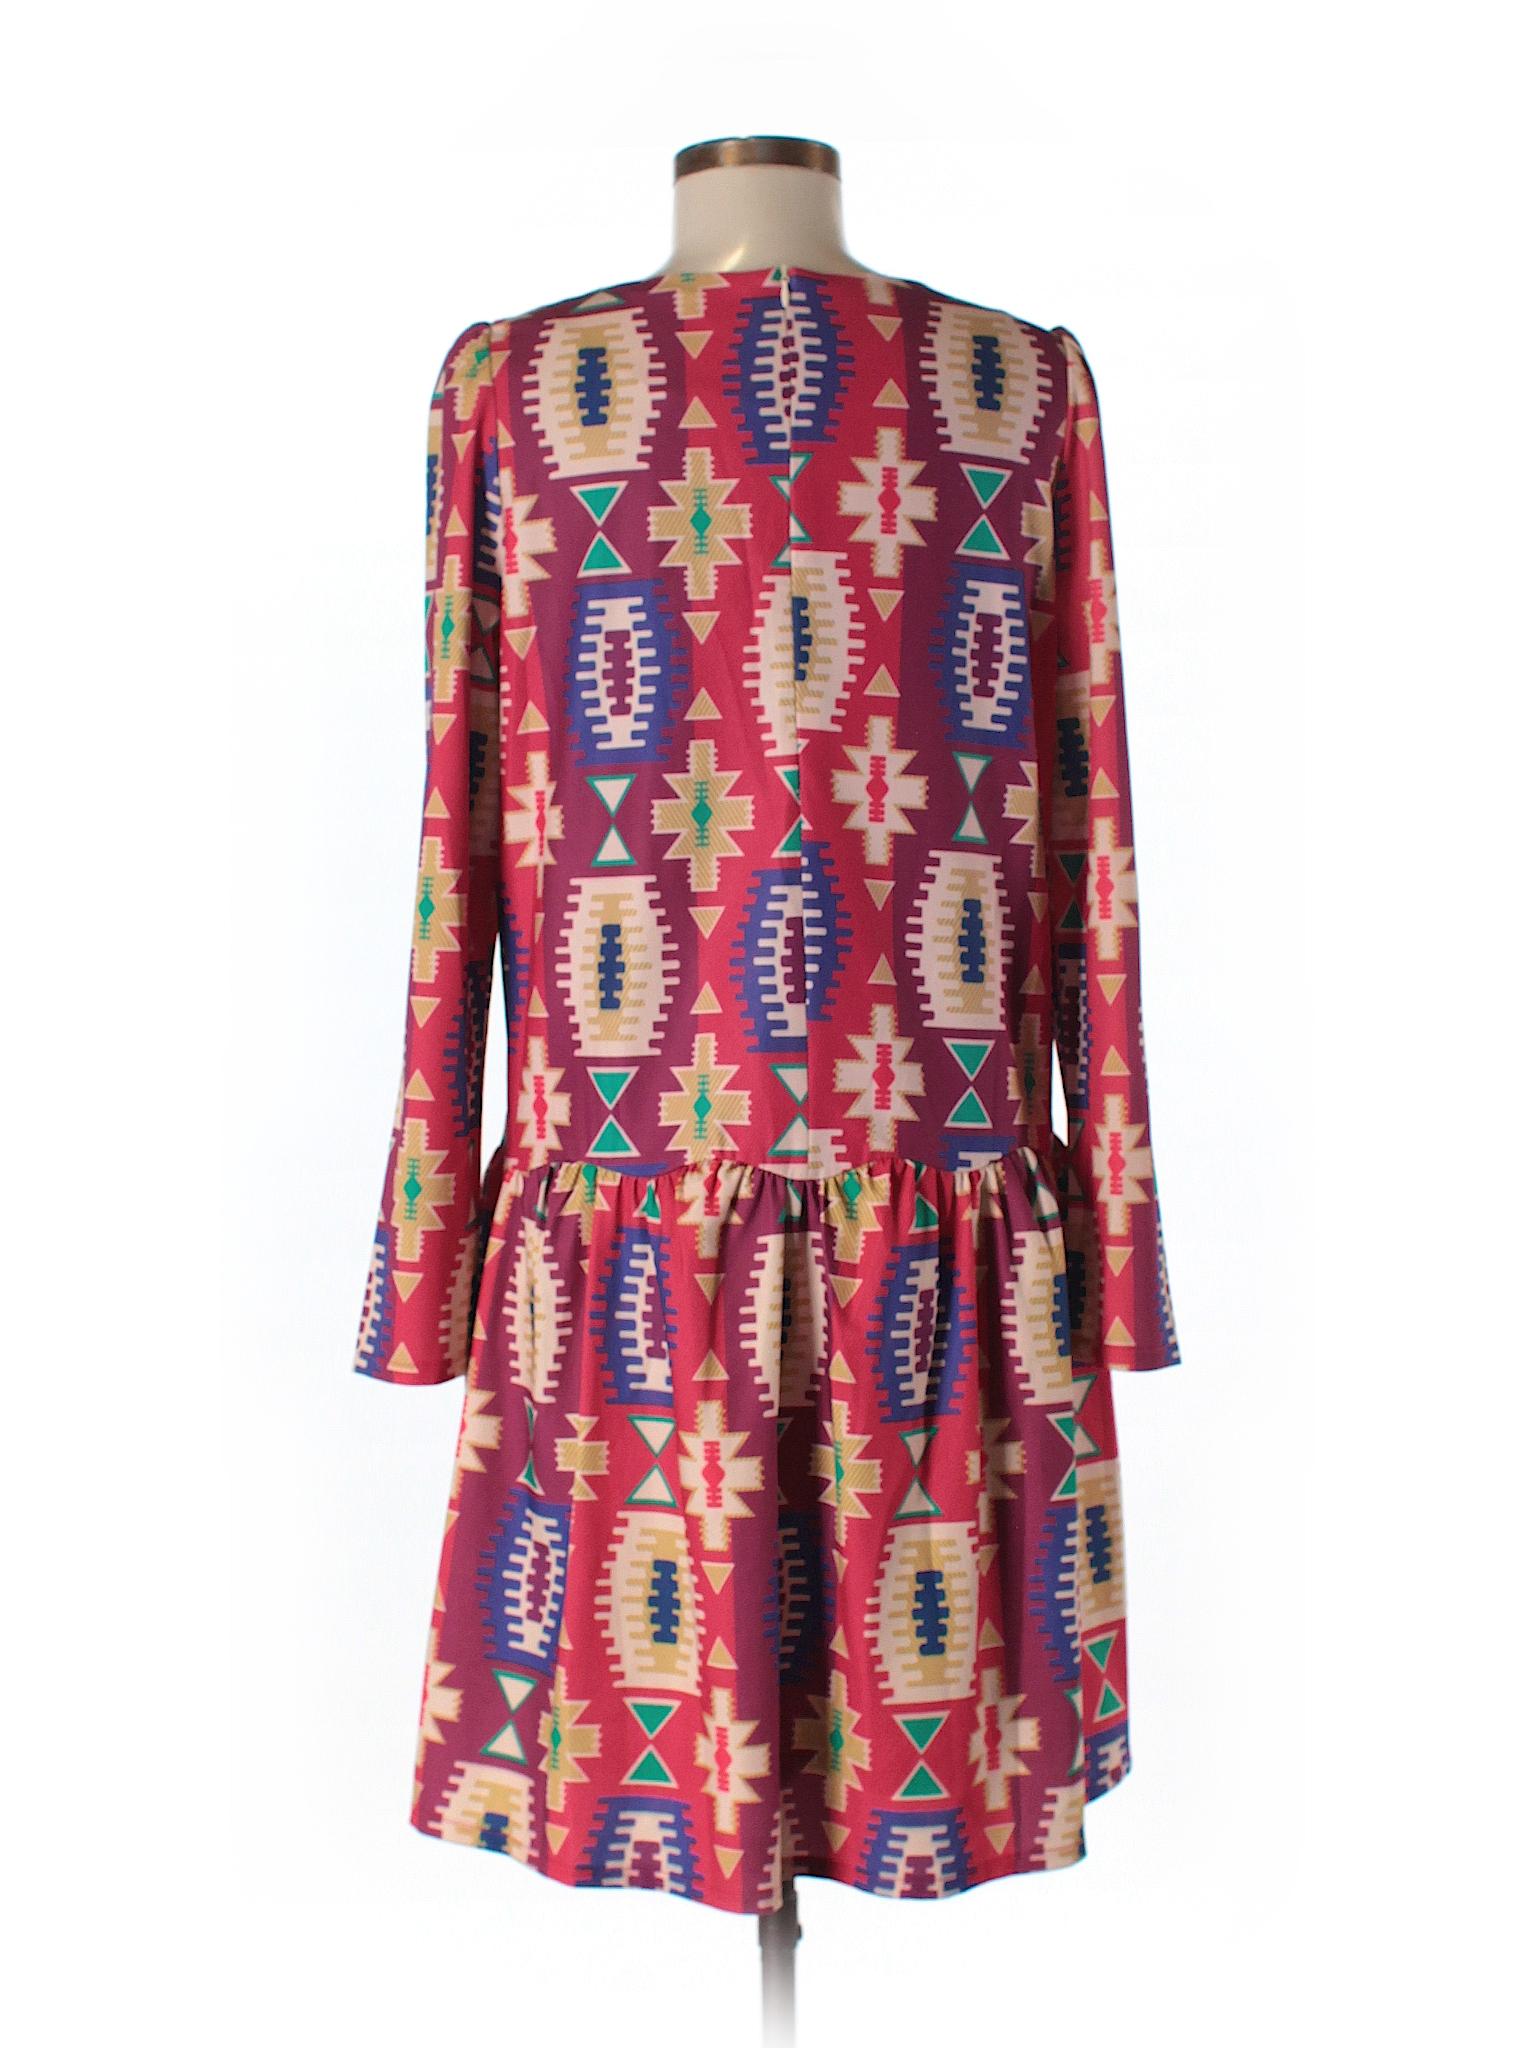 winter Boutique Boutique winter Casual Casual EyeDoll EyeDoll Dress TxwBtOnq5